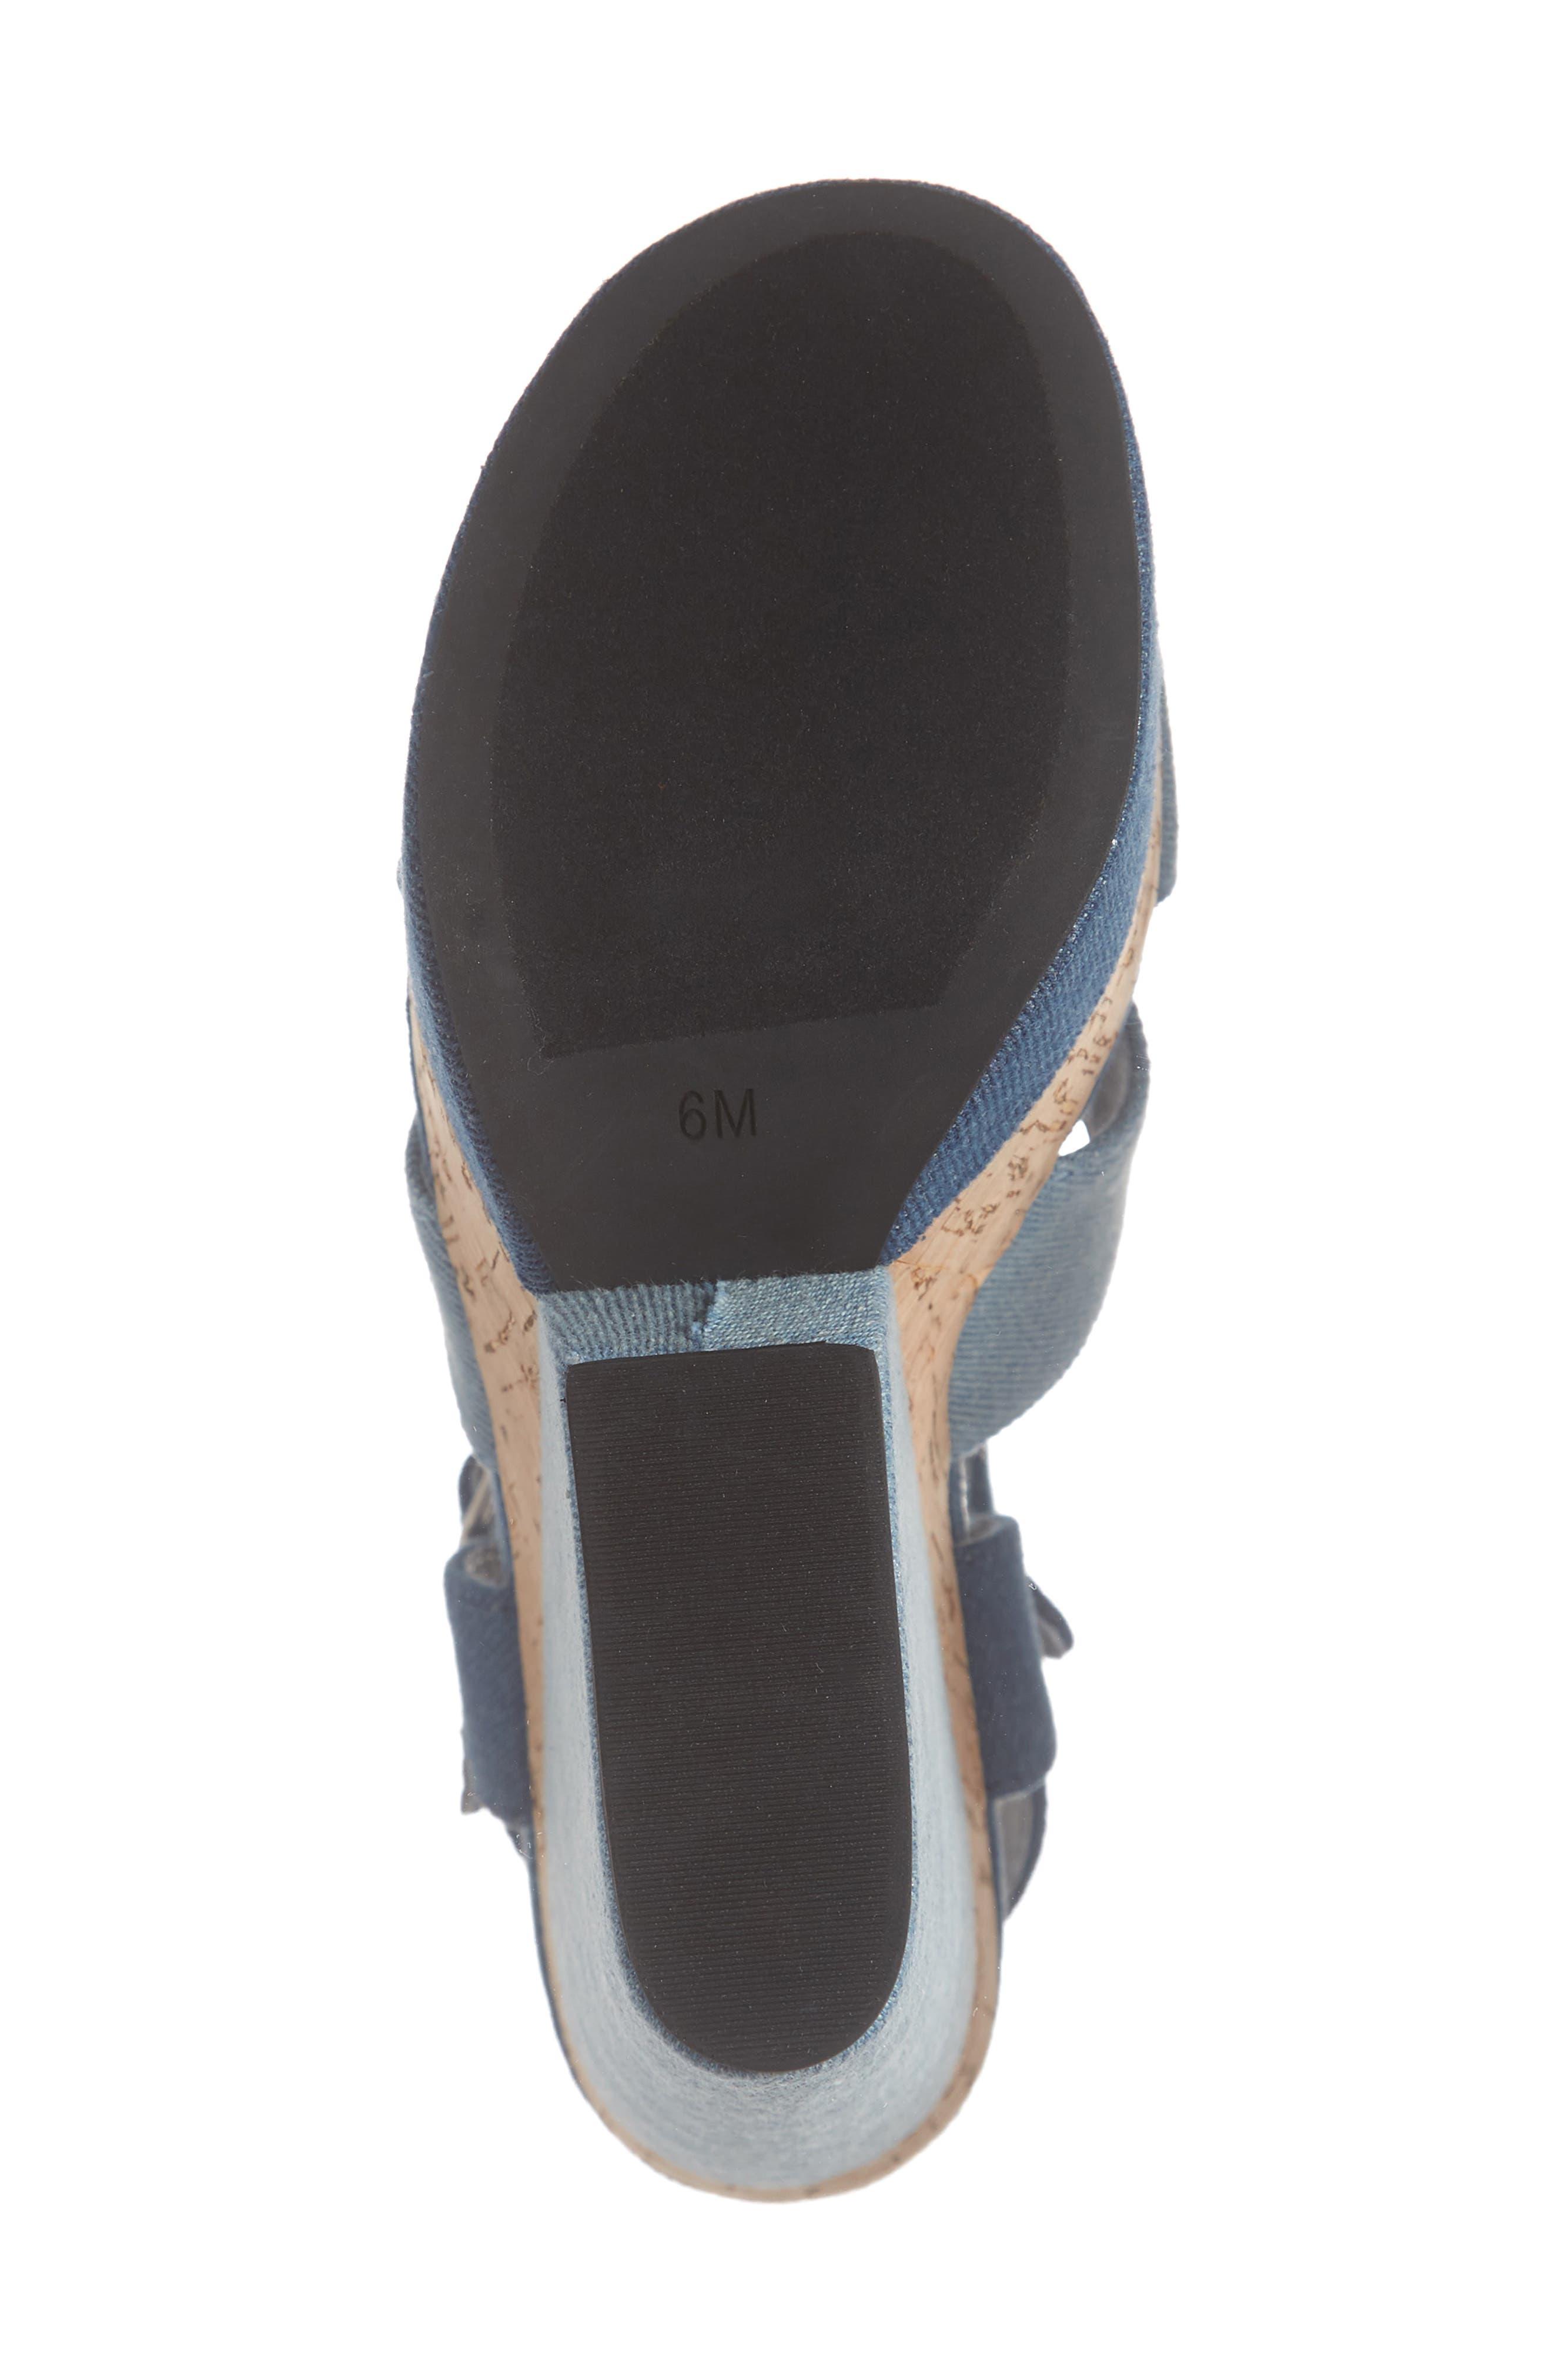 JEFFREY CAMPBELL, Wedge Platform Sandal, Alternate thumbnail 6, color, BLUE DENIM COMBO/ CORK